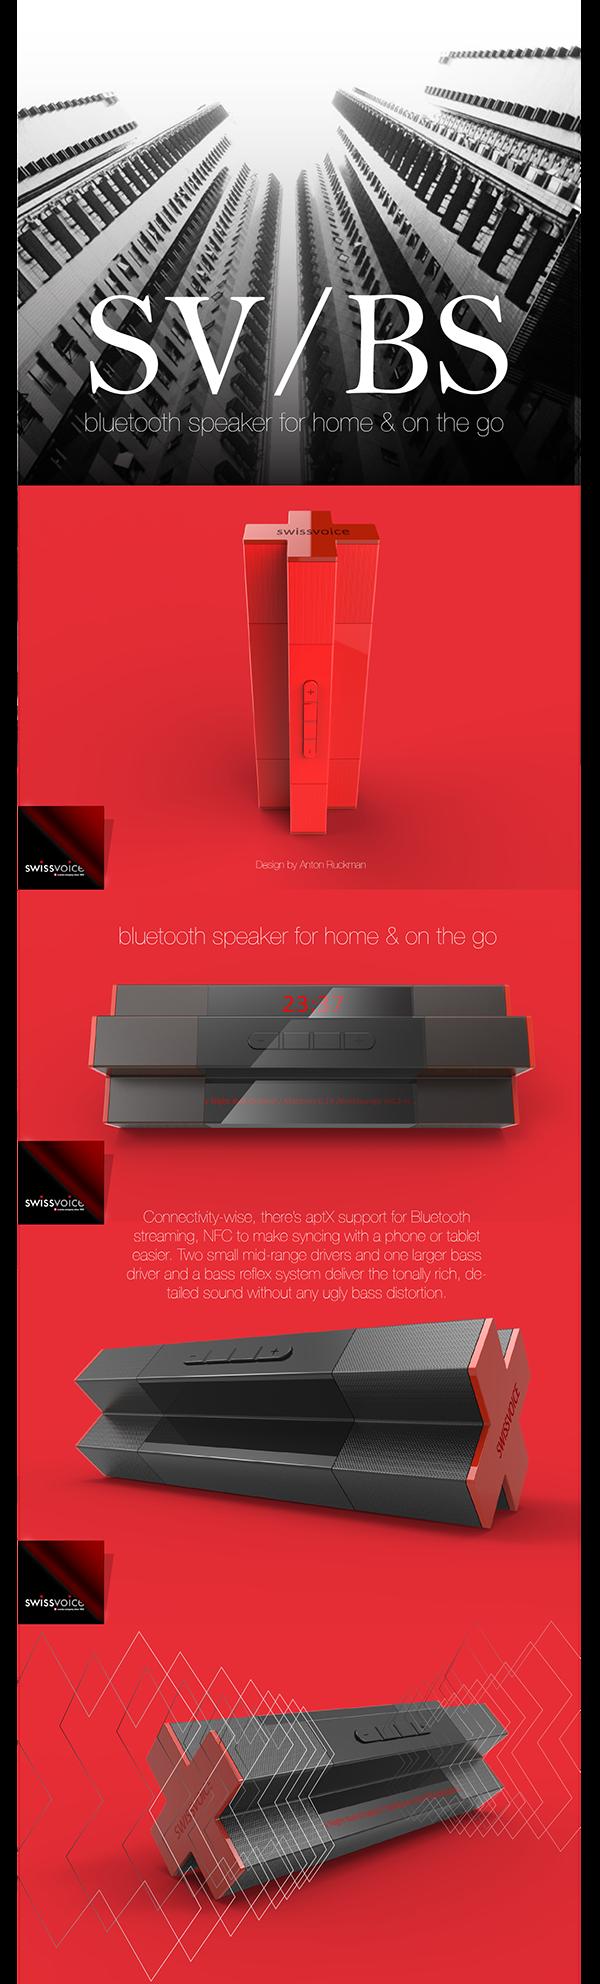 Portable Bluetooth Speaker for Swissvoice by Anton Ruckman, via Behance